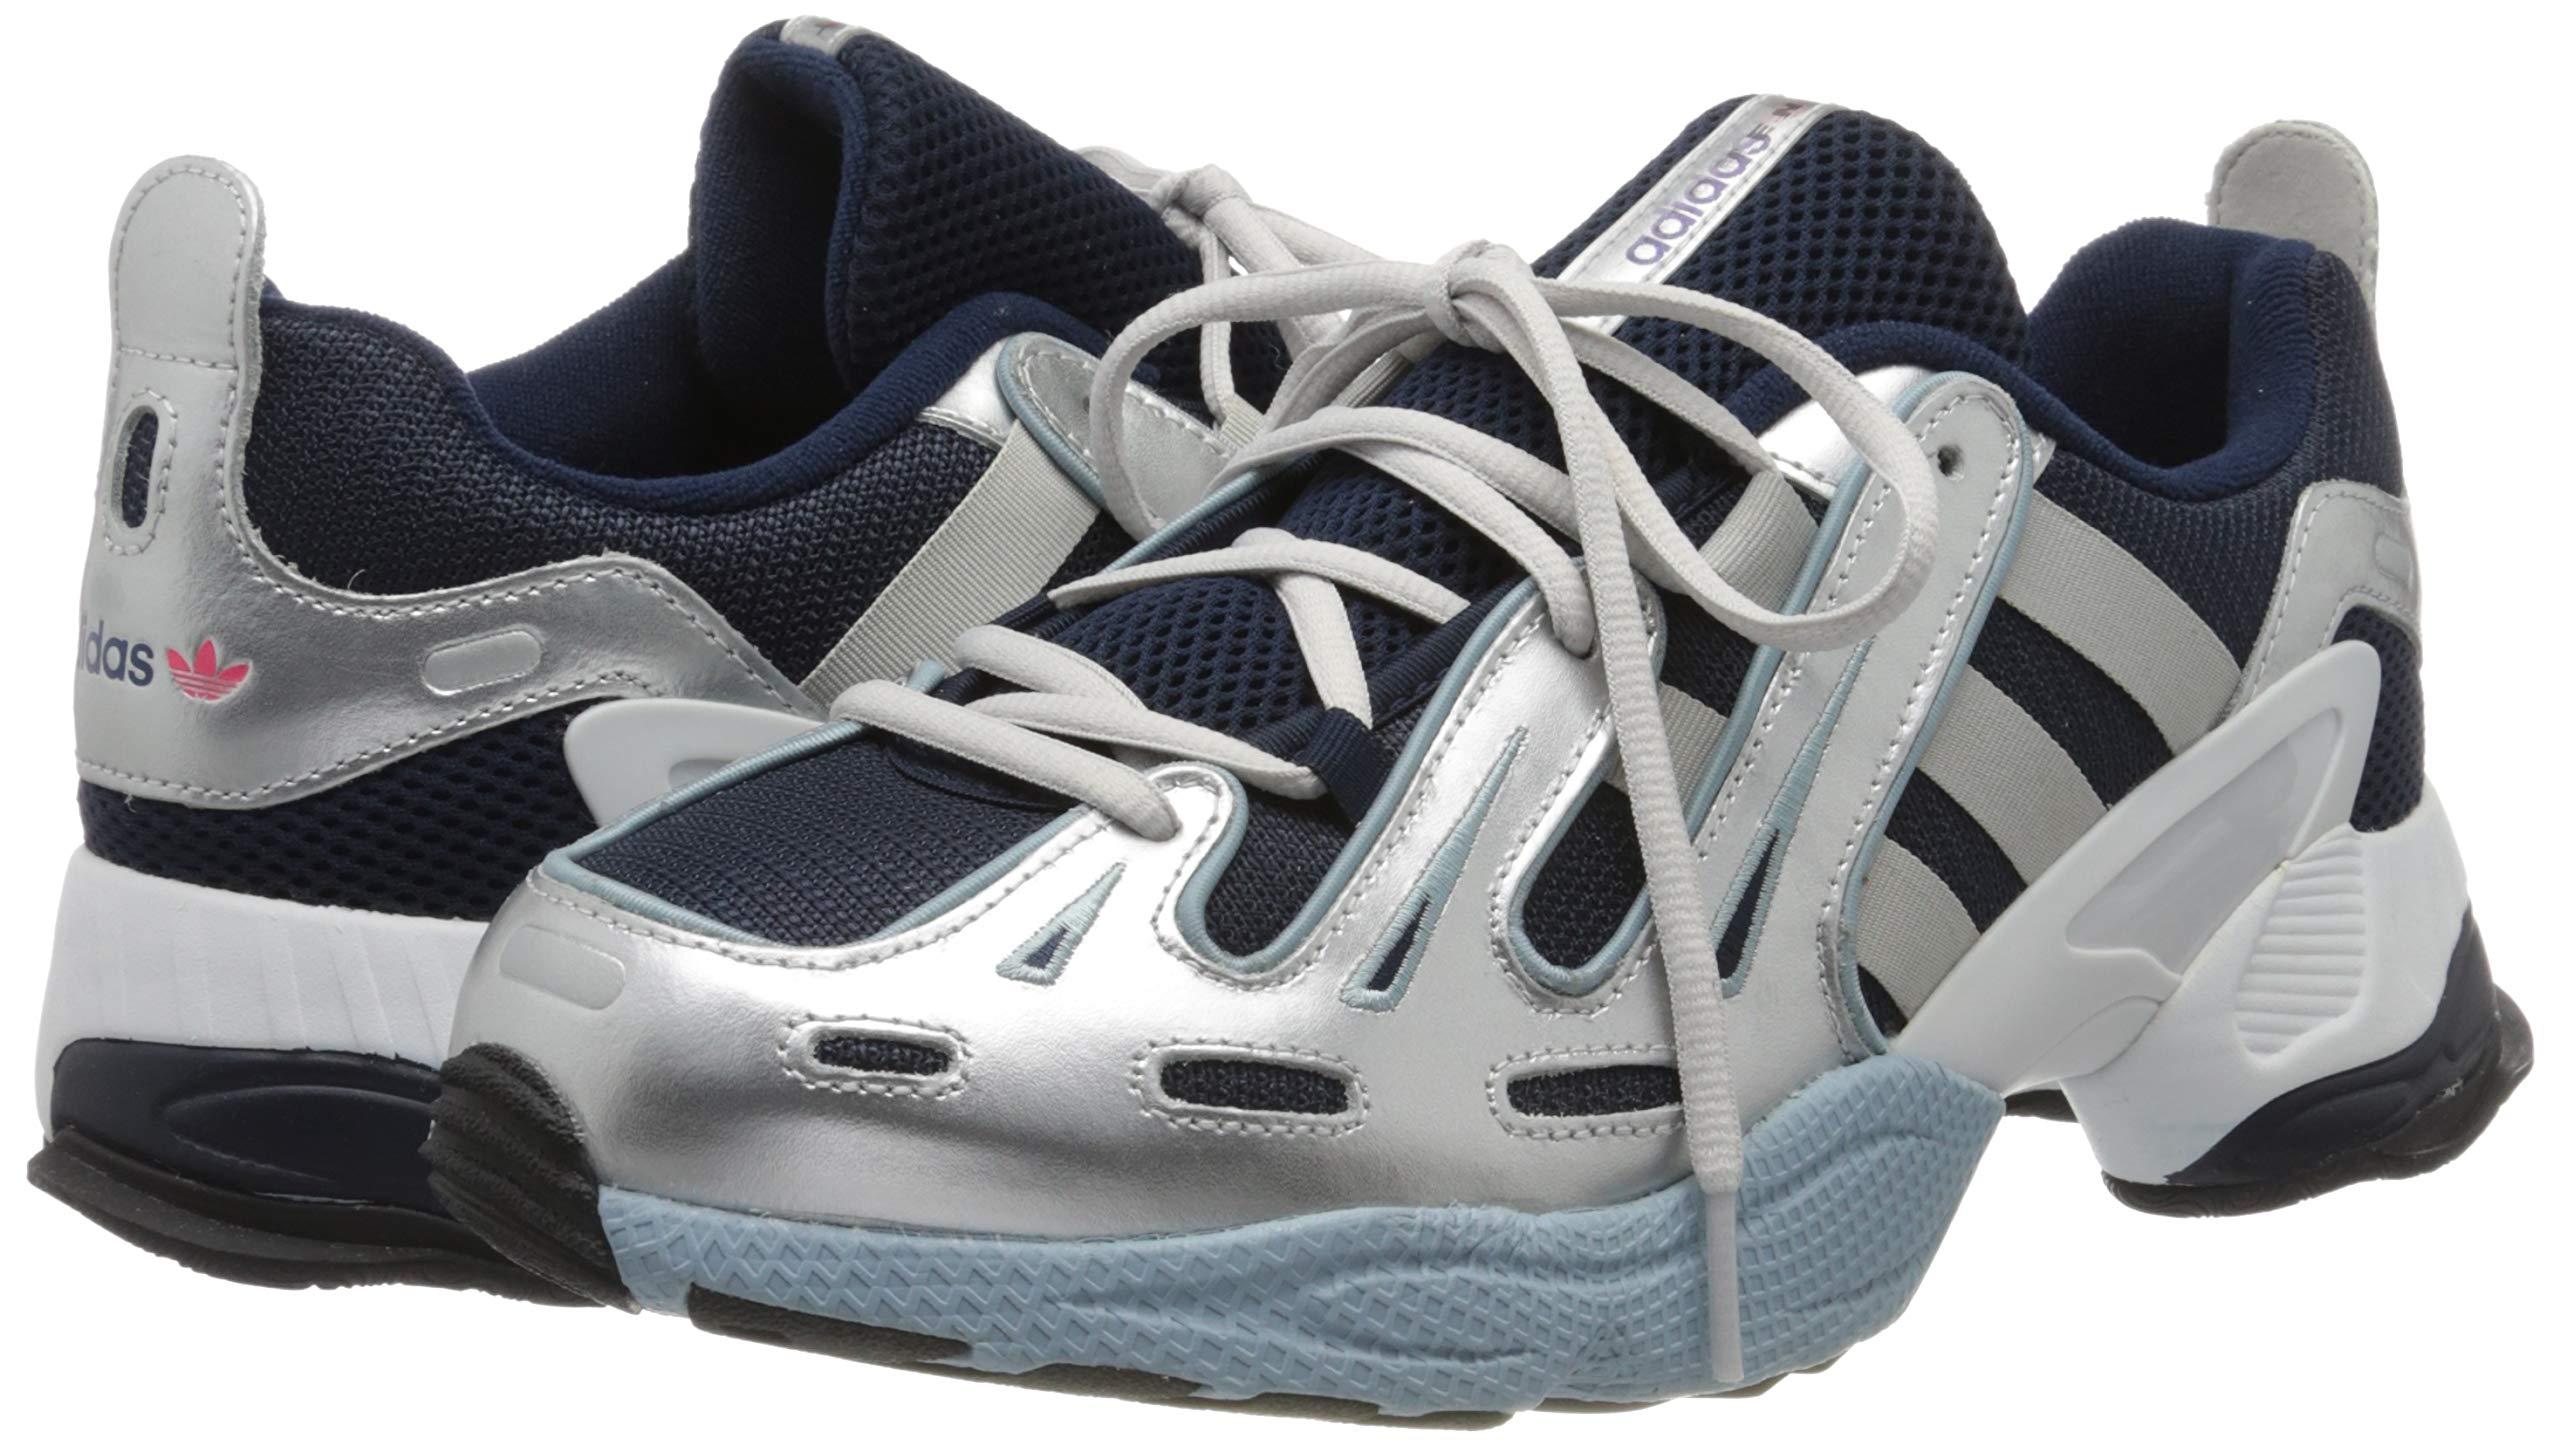 adidas EQT Gazelle, Scarpe da Ginnastica Uomo 5 spesavip